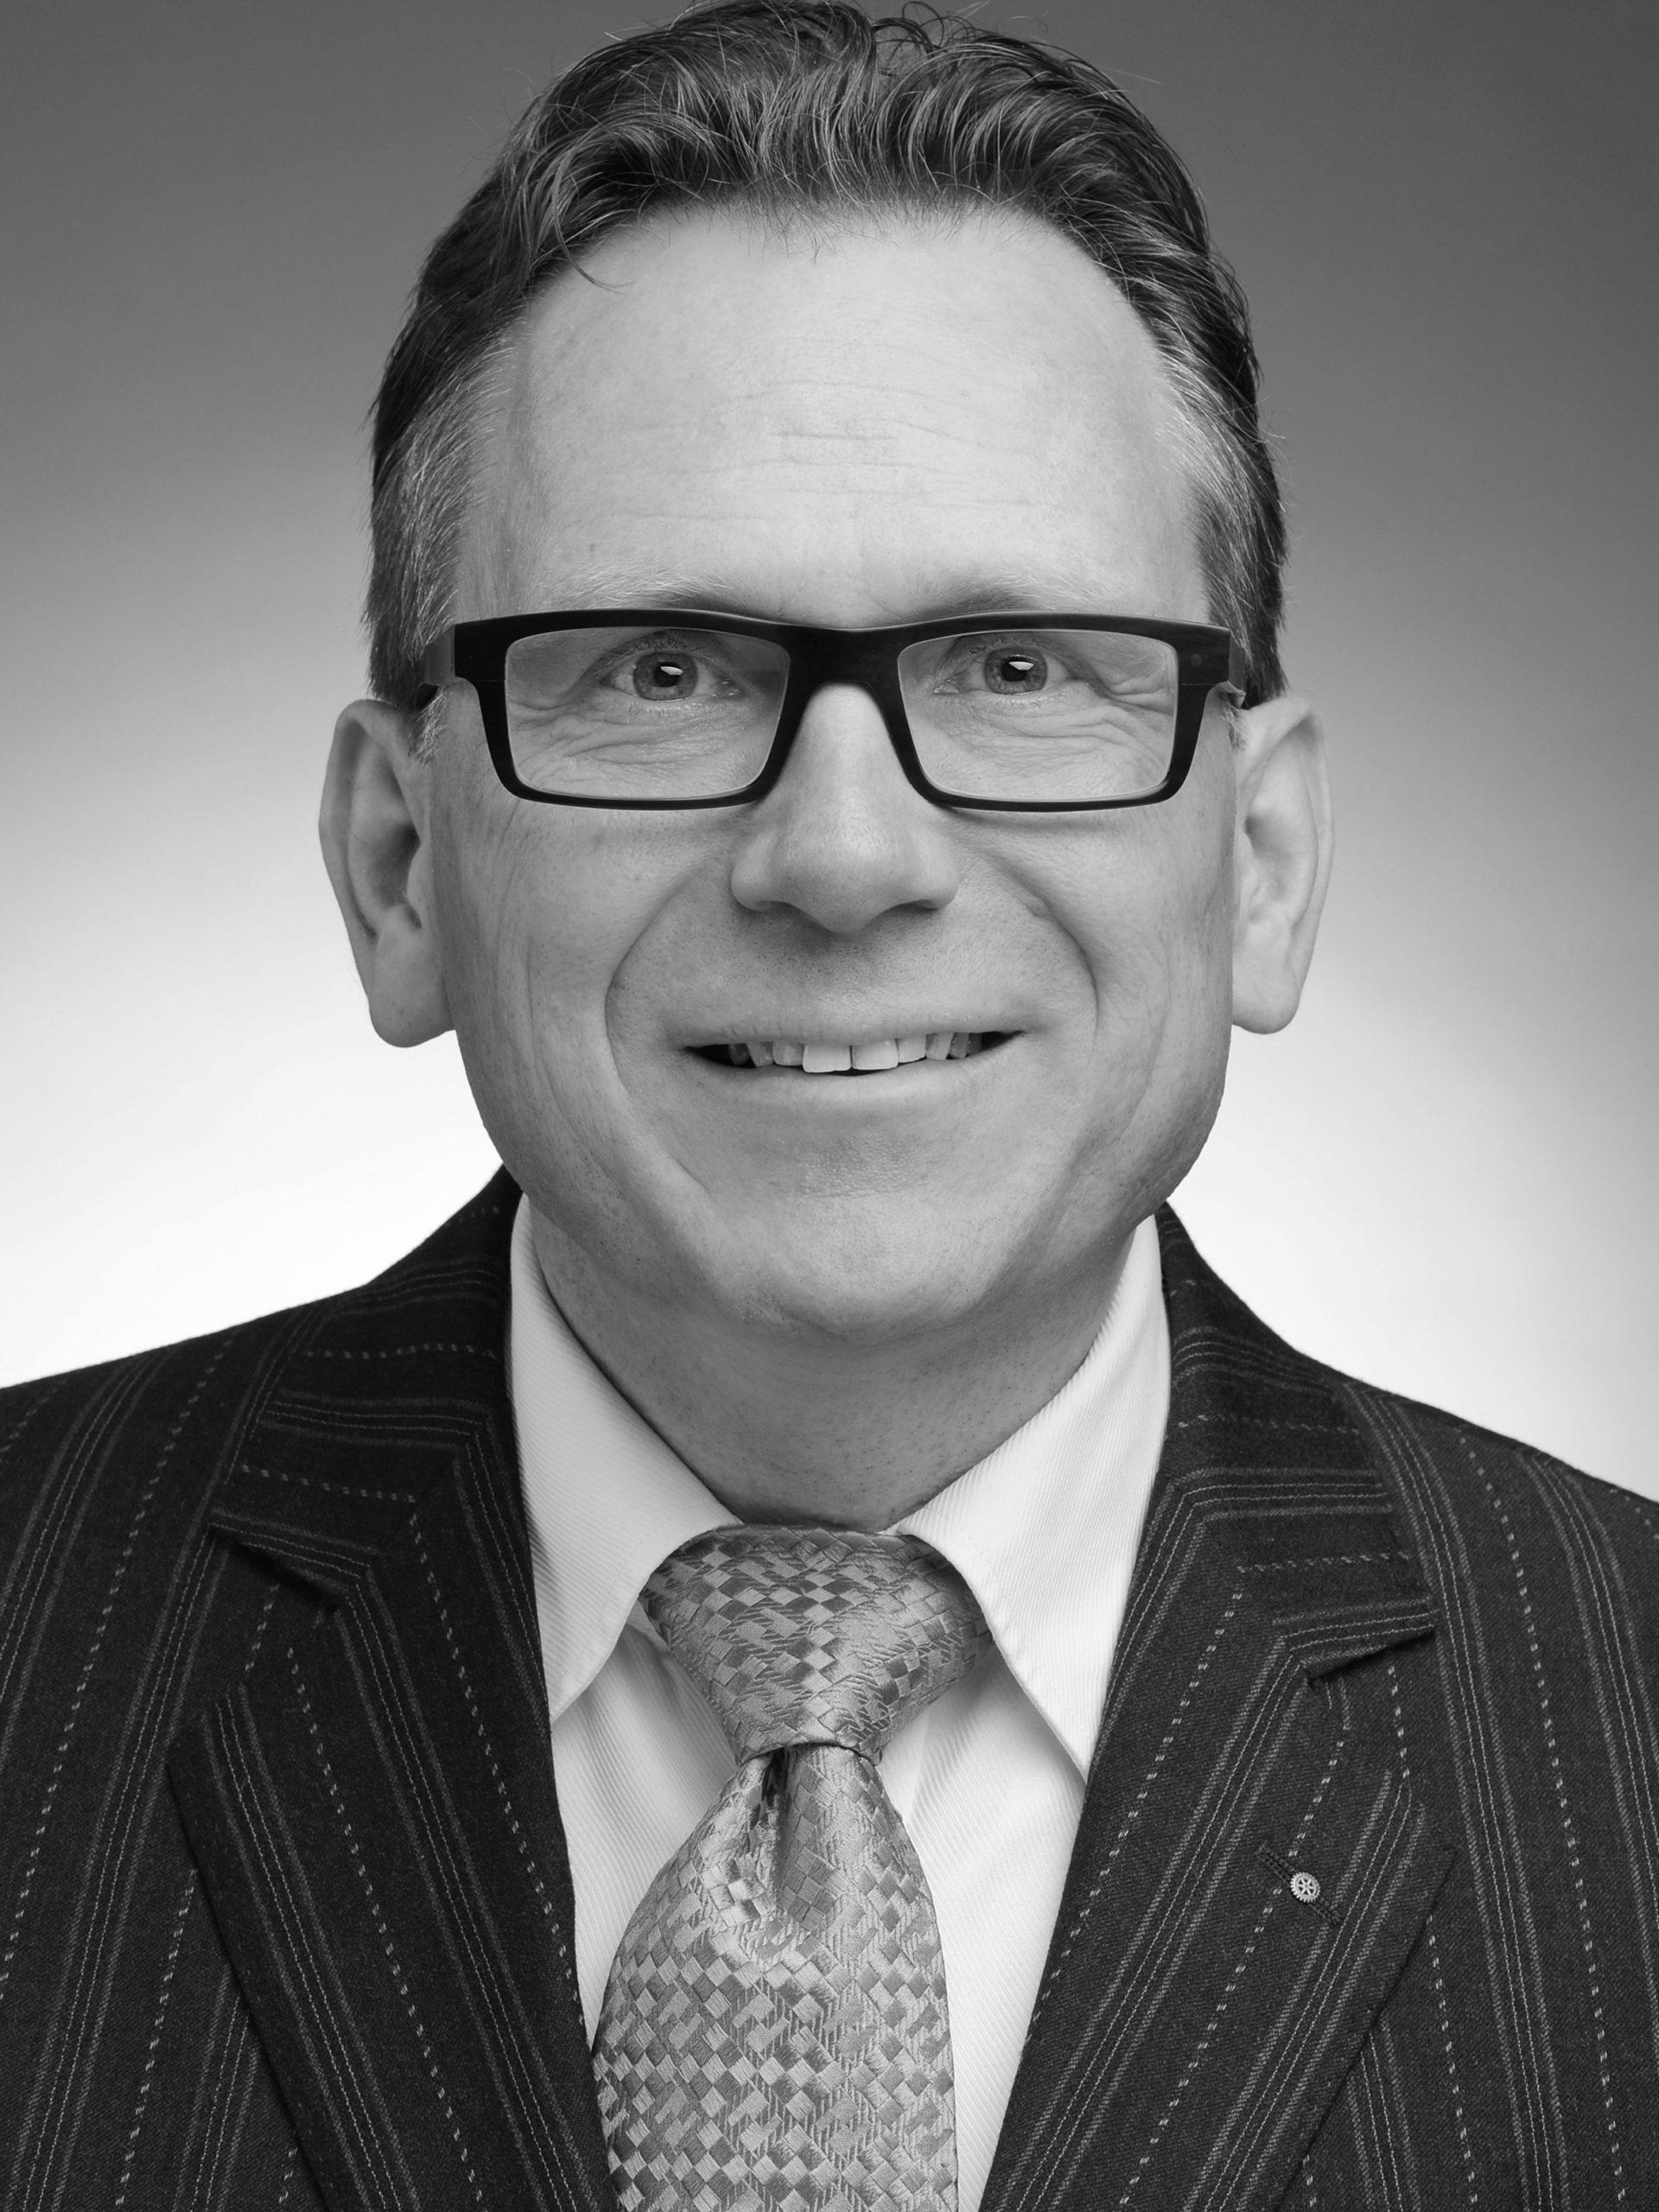 Georg Spycher